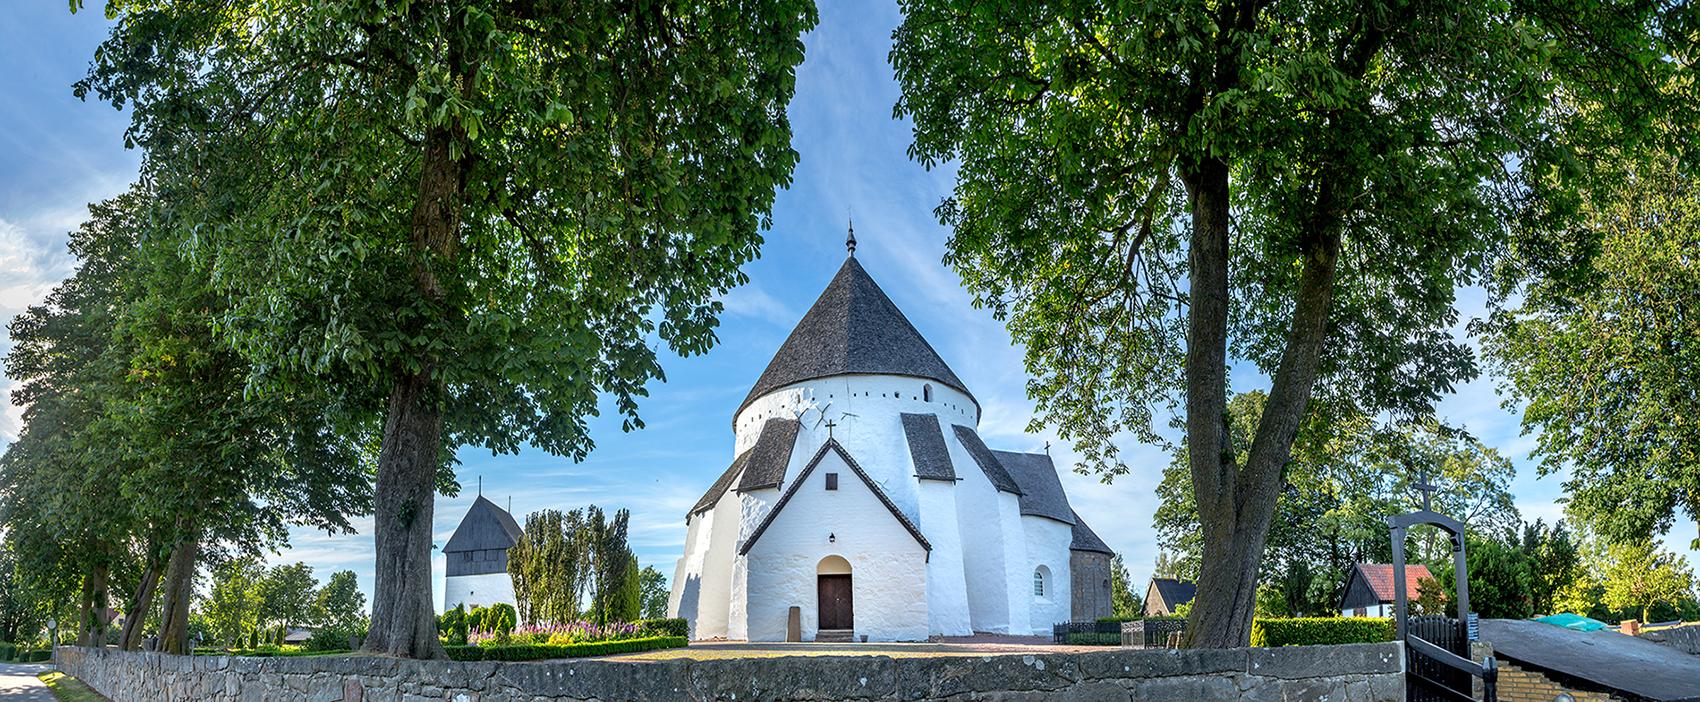 Østerlars-Rundkirke-Destination-Bornholm